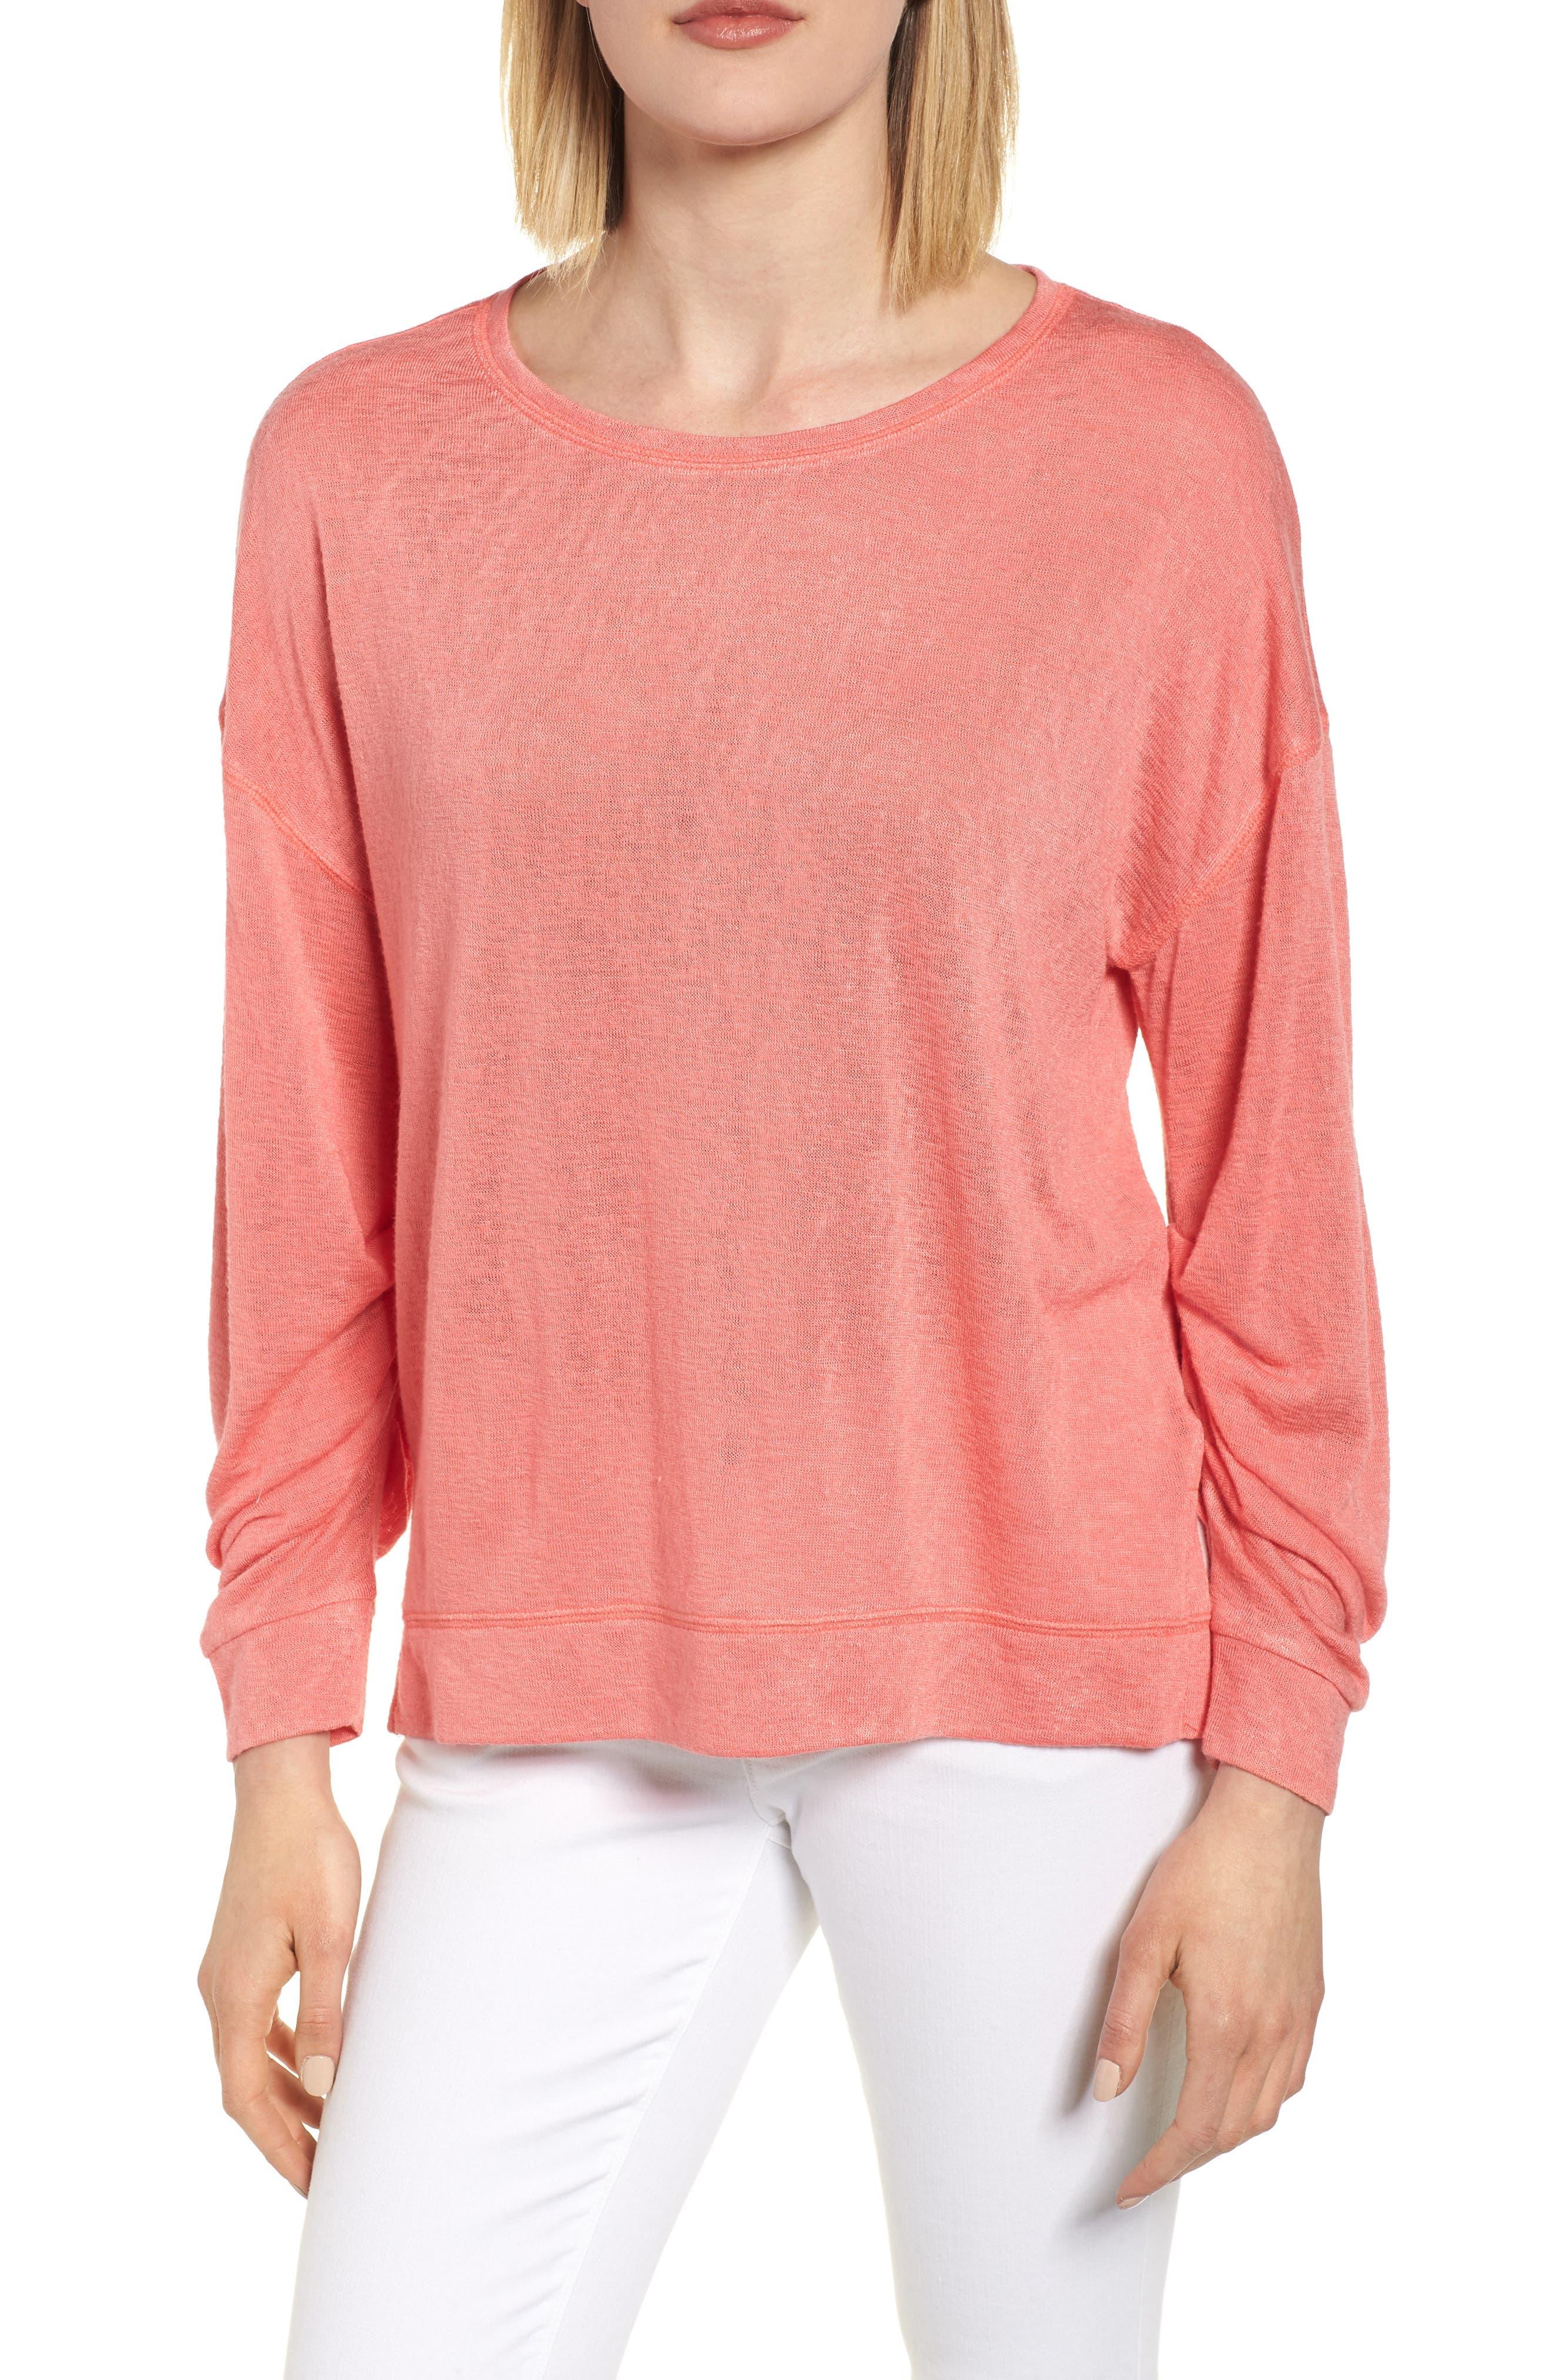 Tuck Sleeve Sweatshirt,                             Main thumbnail 1, color,                             Coral Rose